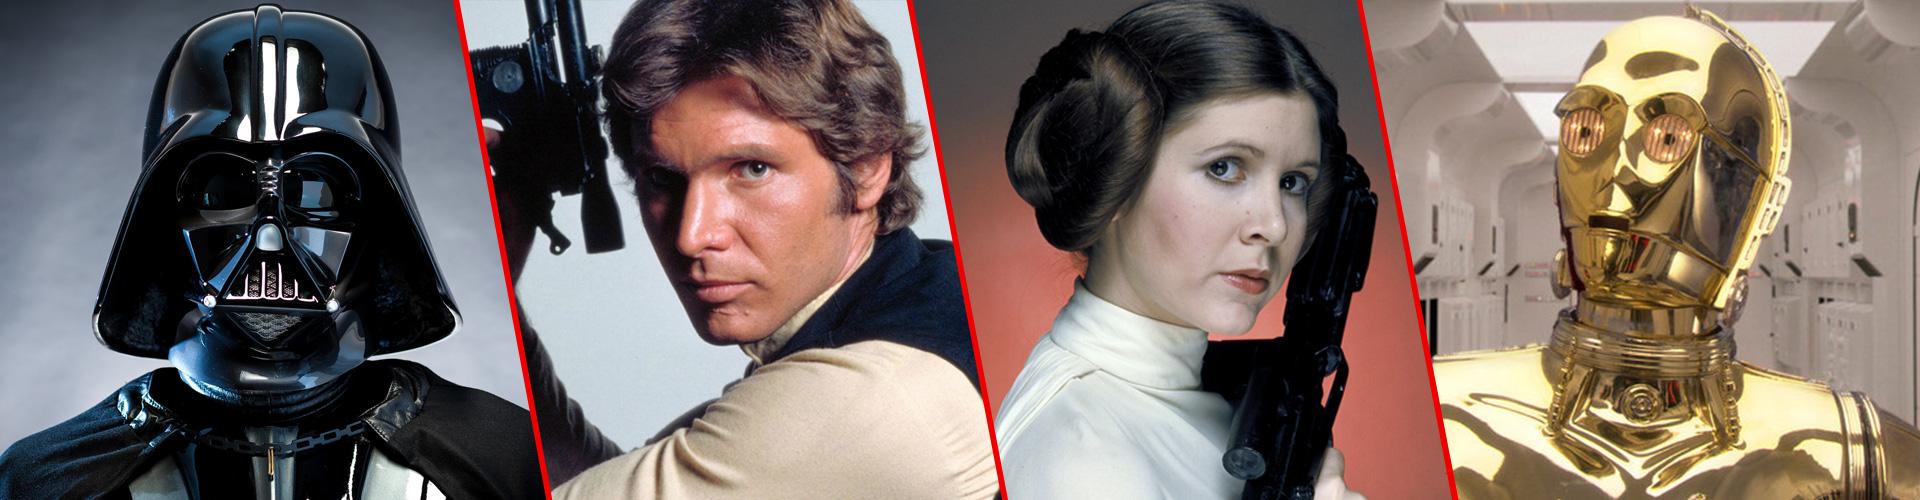 star-wars-WATN-header.jpg